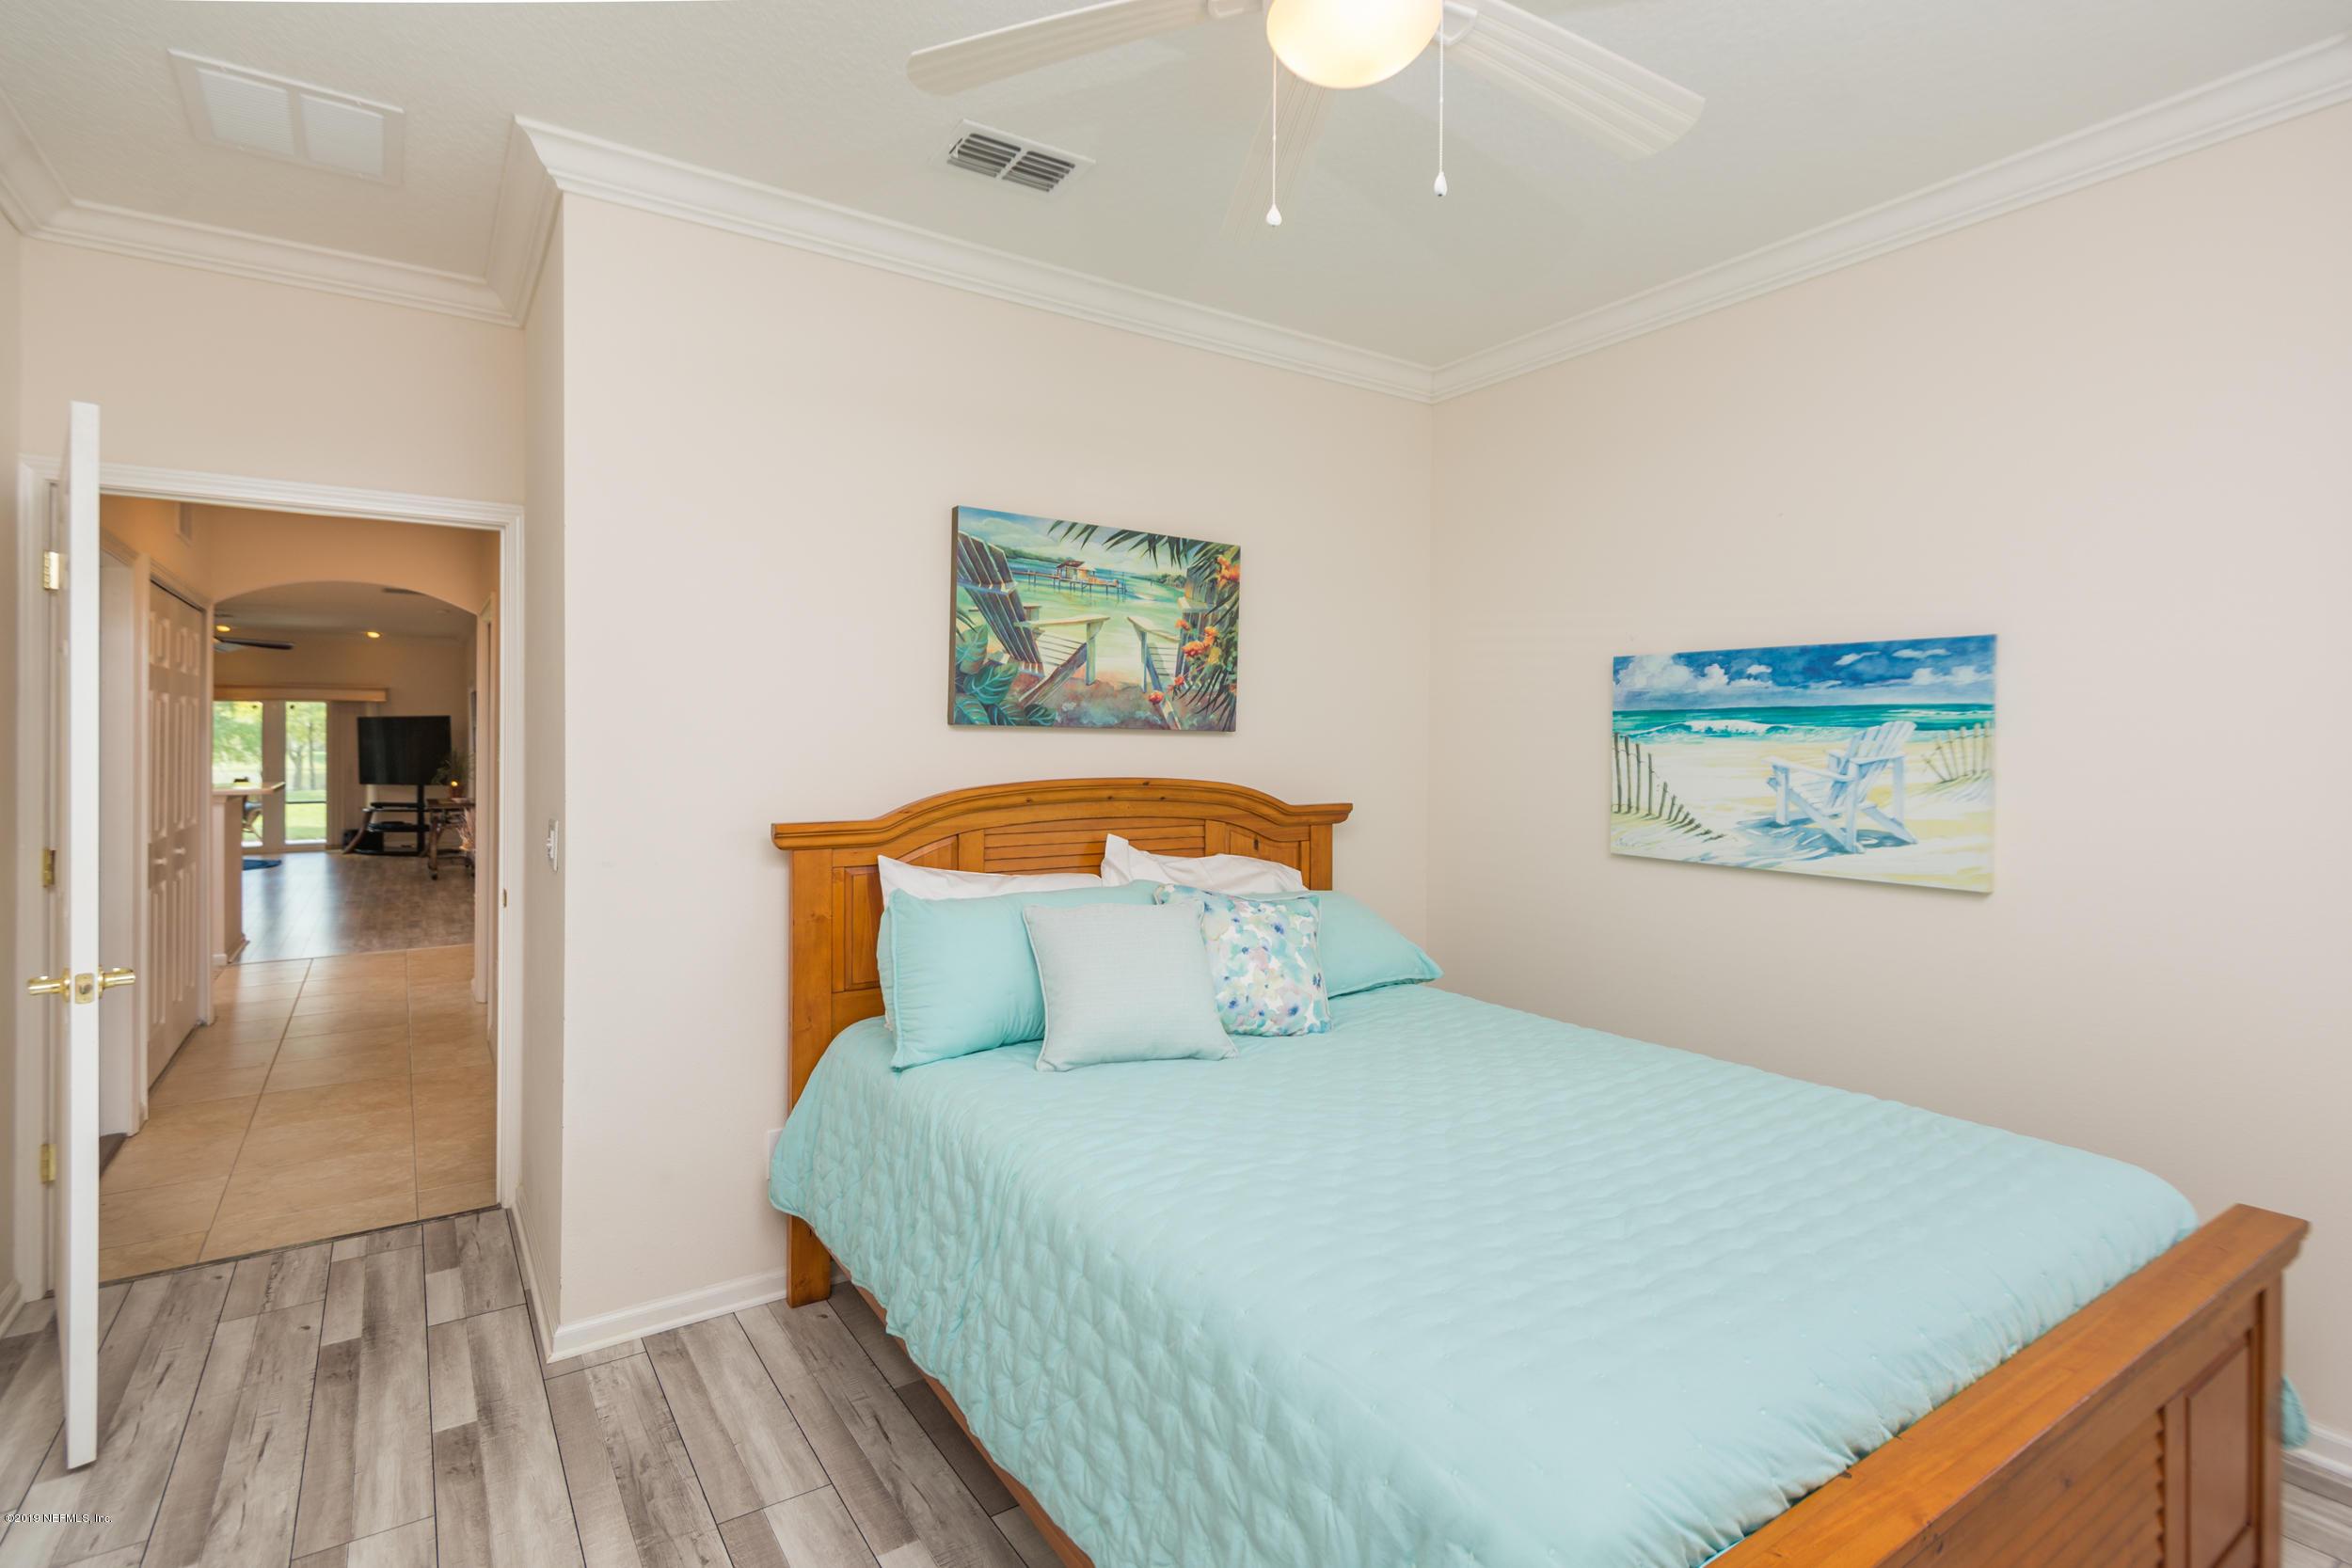 551 WOODED CROSSING, ST AUGUSTINE, FLORIDA 32084, 3 Bedrooms Bedrooms, ,2 BathroomsBathrooms,Condo,For sale,WOODED CROSSING,1017556